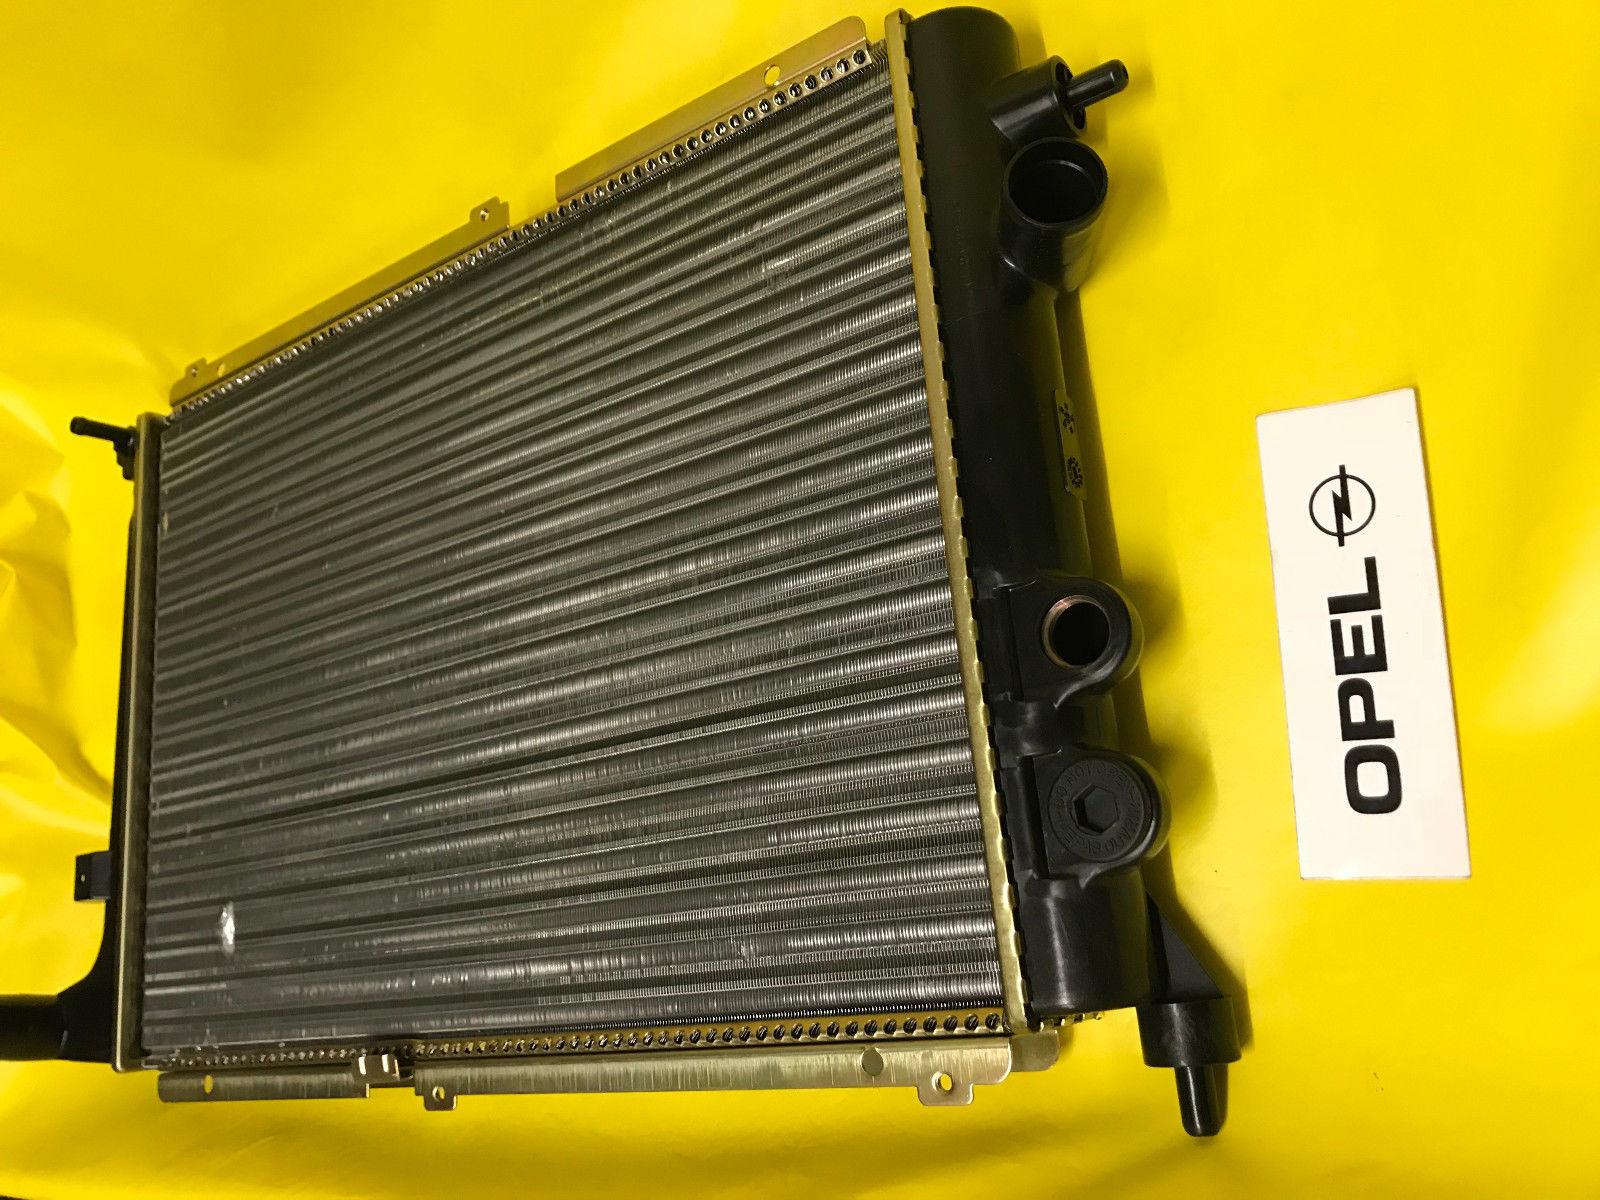 NEU Erstausrüster Kühler Opel Calibra Vectra A 2,0 i Turbo mit 204 PS C20LET 4x4